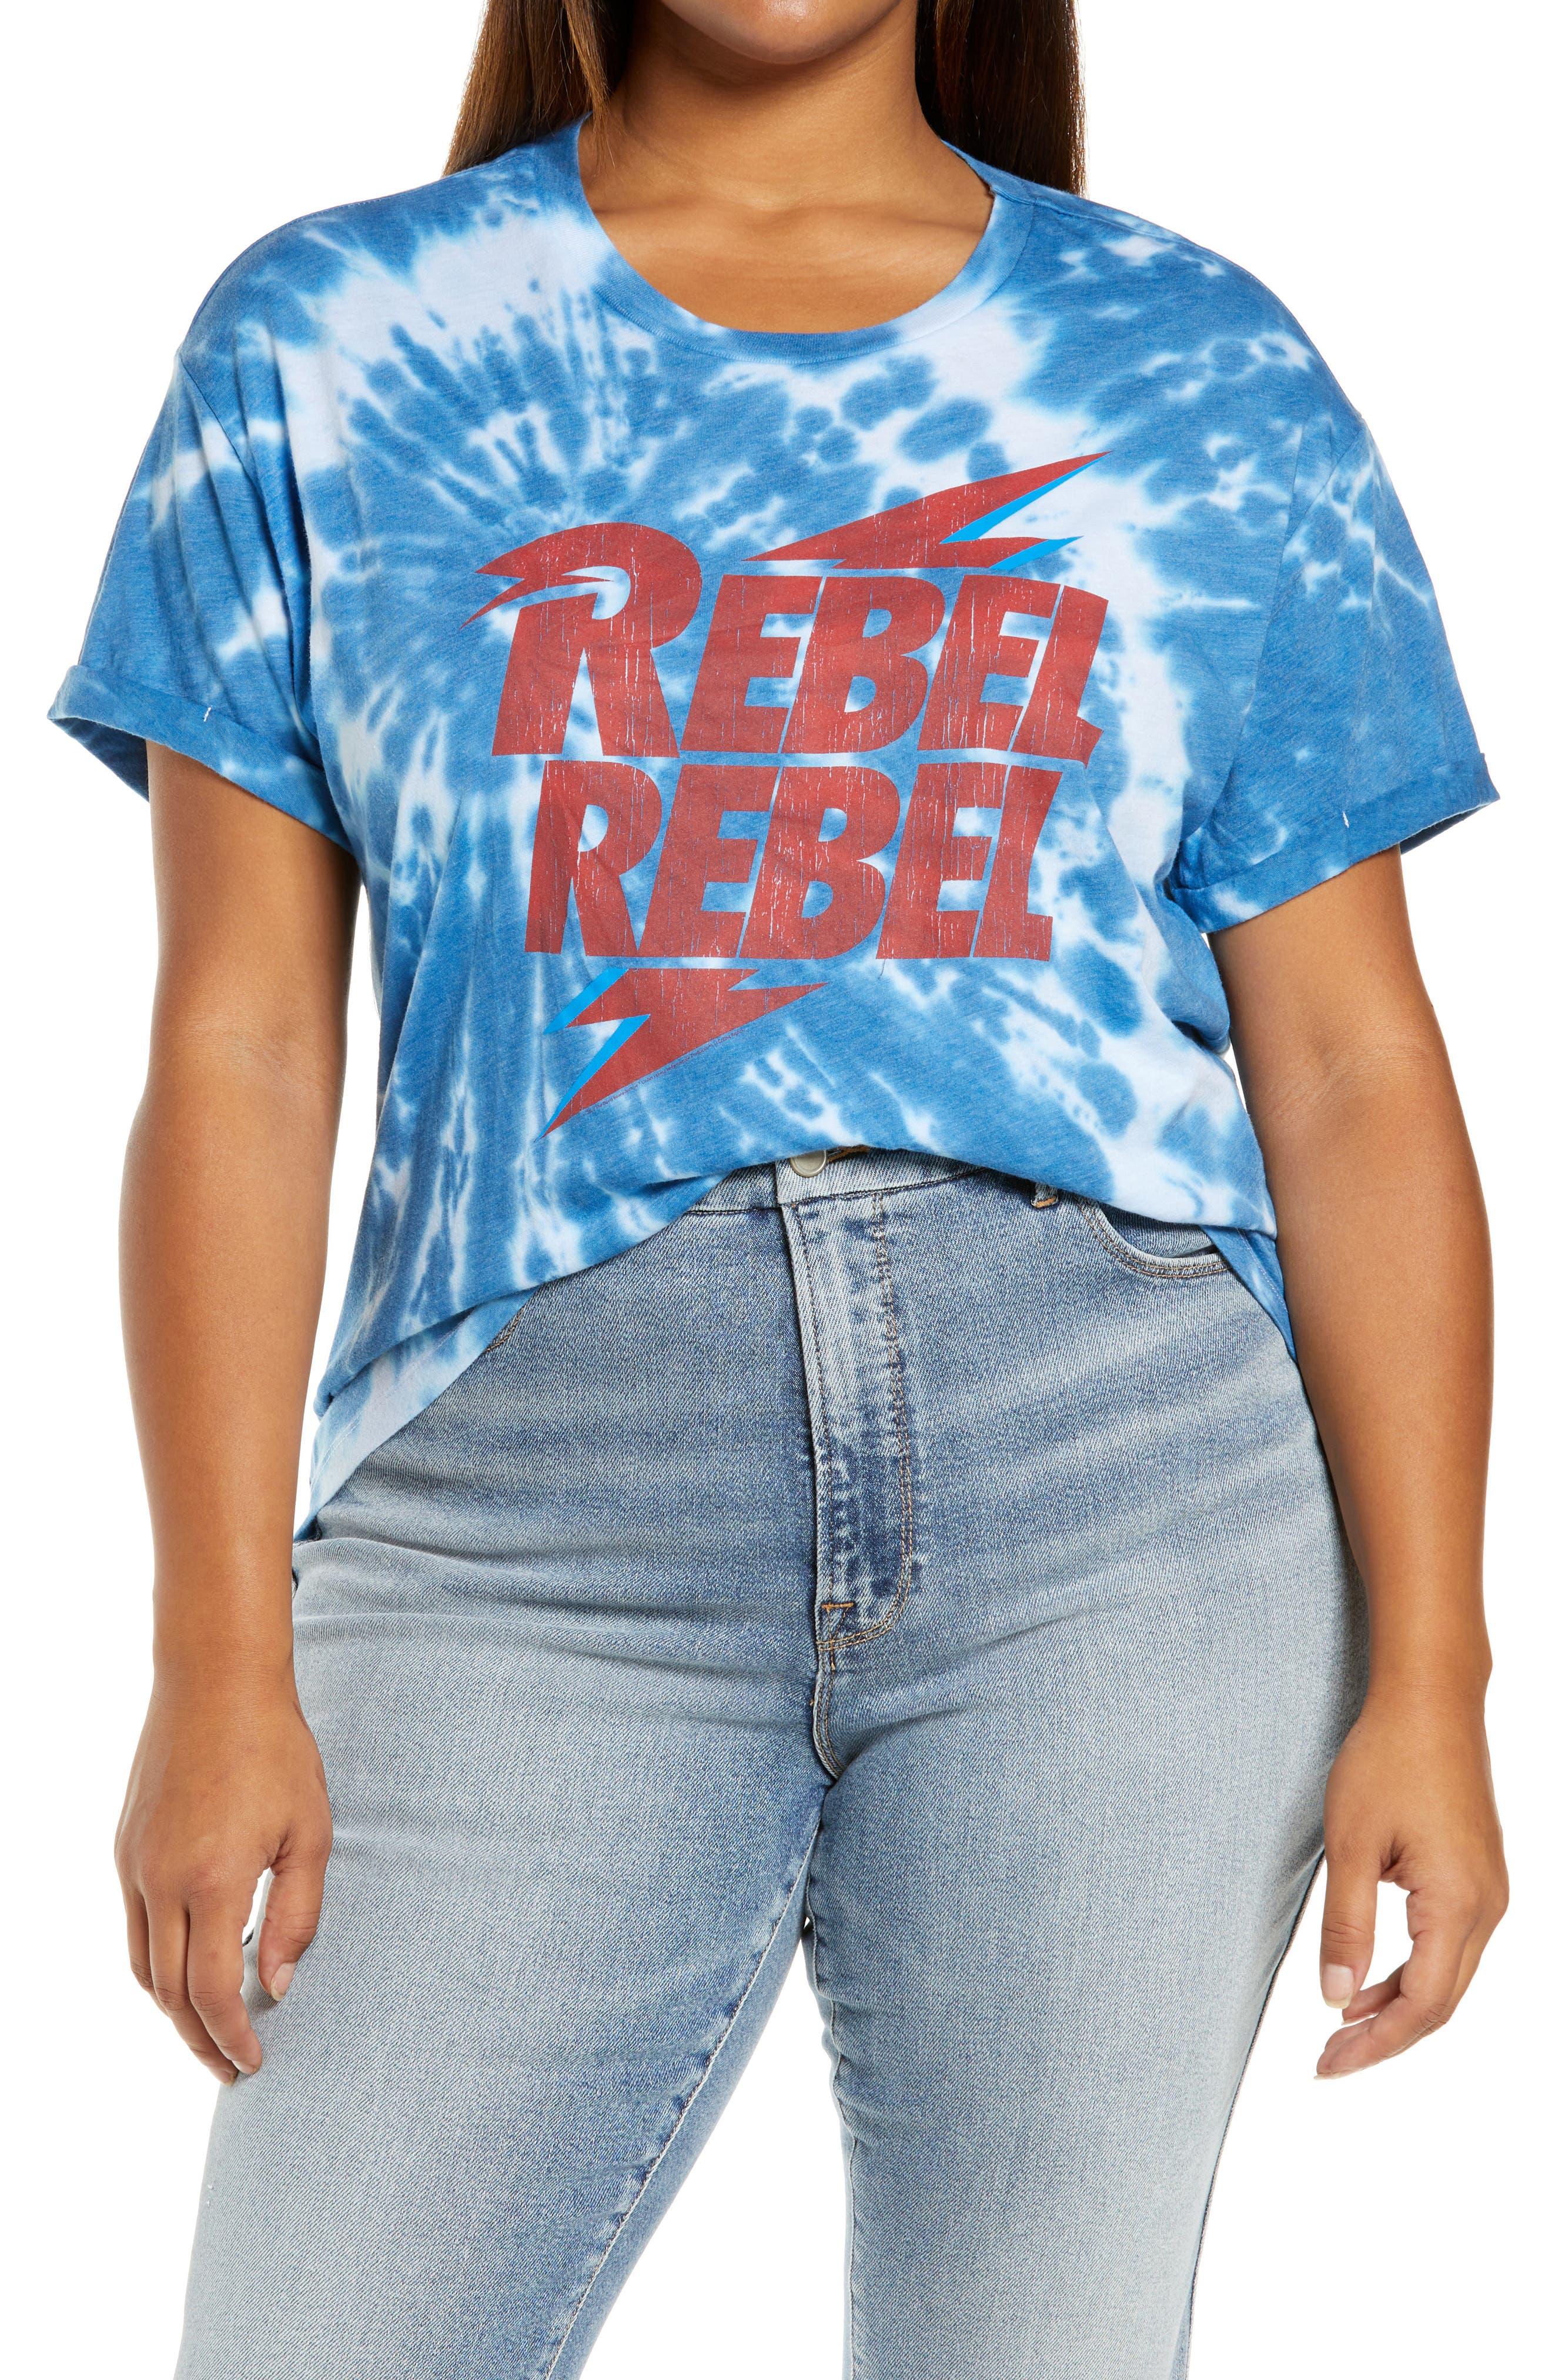 Rebel Rebel Tie Dye Graphic Tee